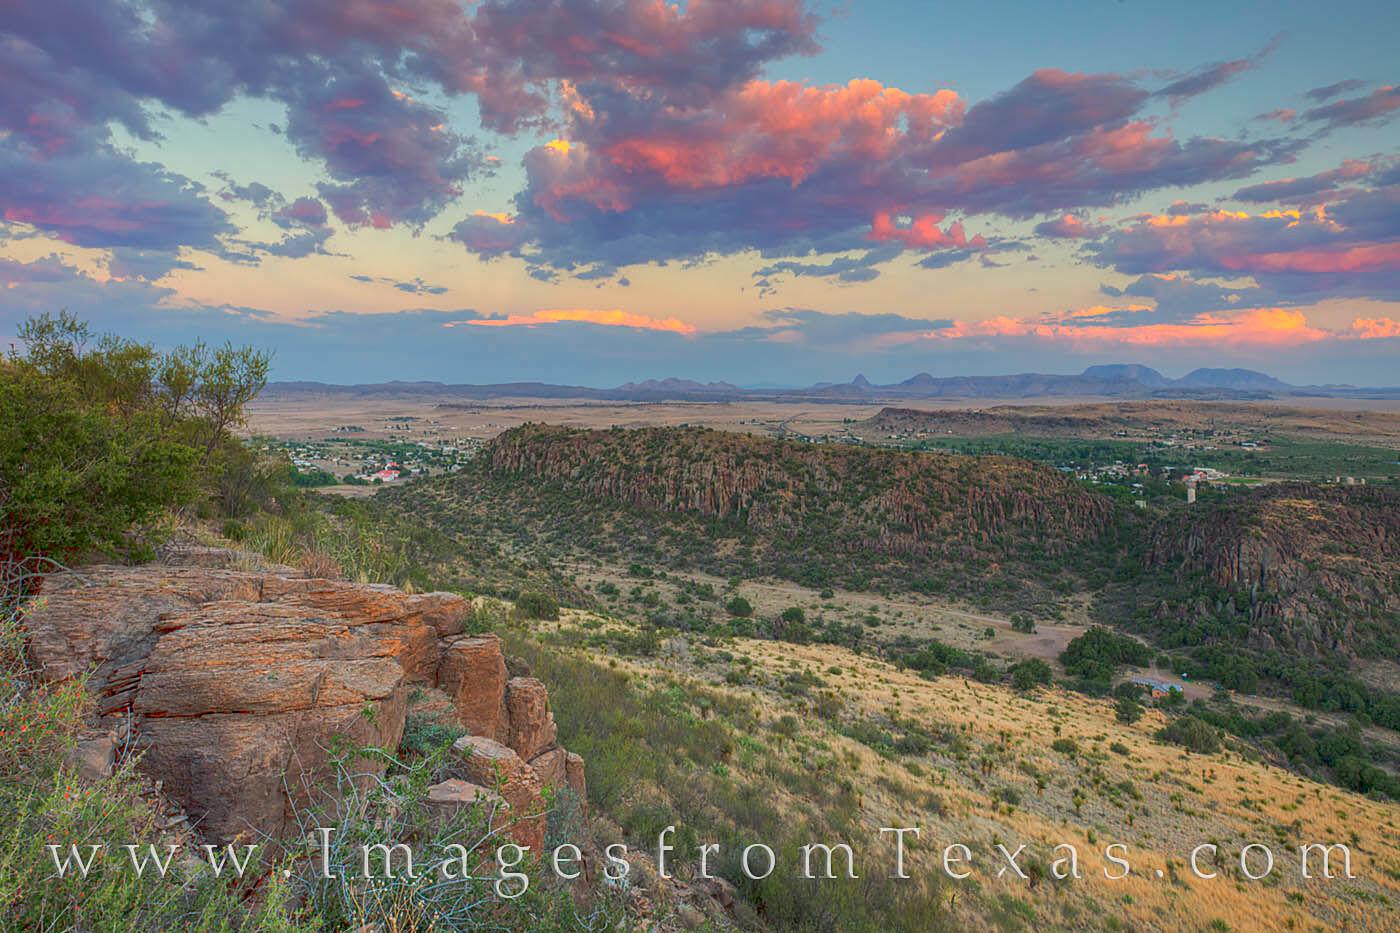 Davis Mountains Fort davis, CCC trail, Texas state parks, west Texas, Davis Mountains images, Texas sunset, photo